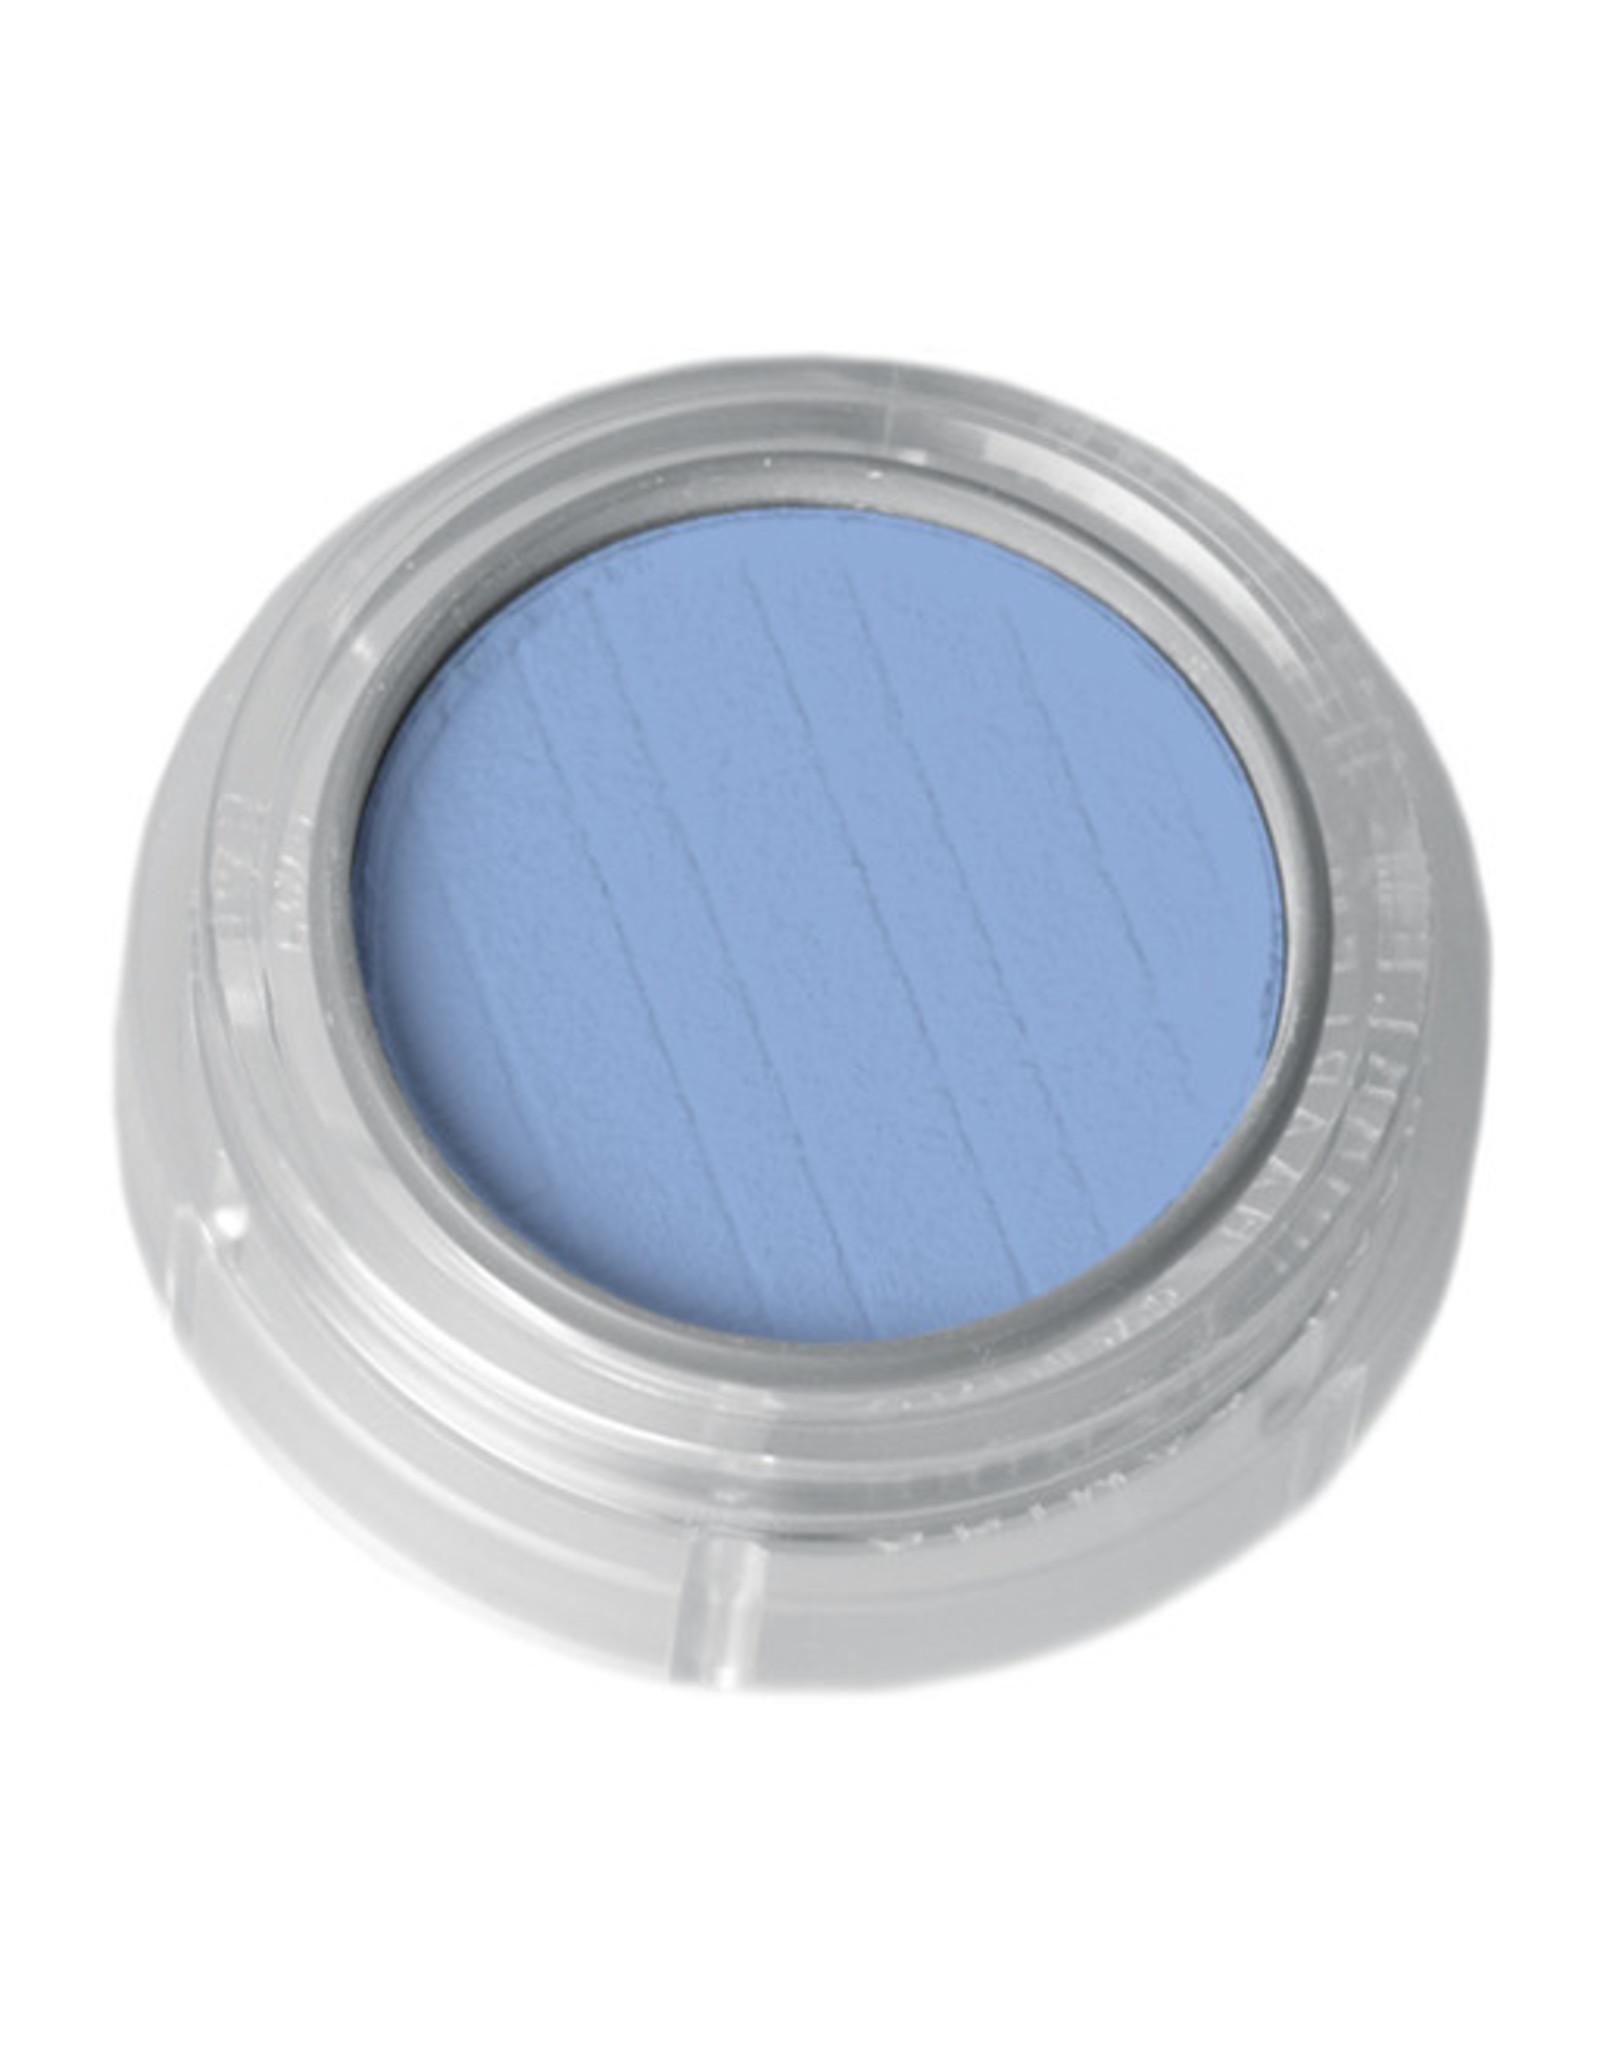 Grimas EYESHADOW/ROUGE 382 Pastelblauw A1 (2 g)